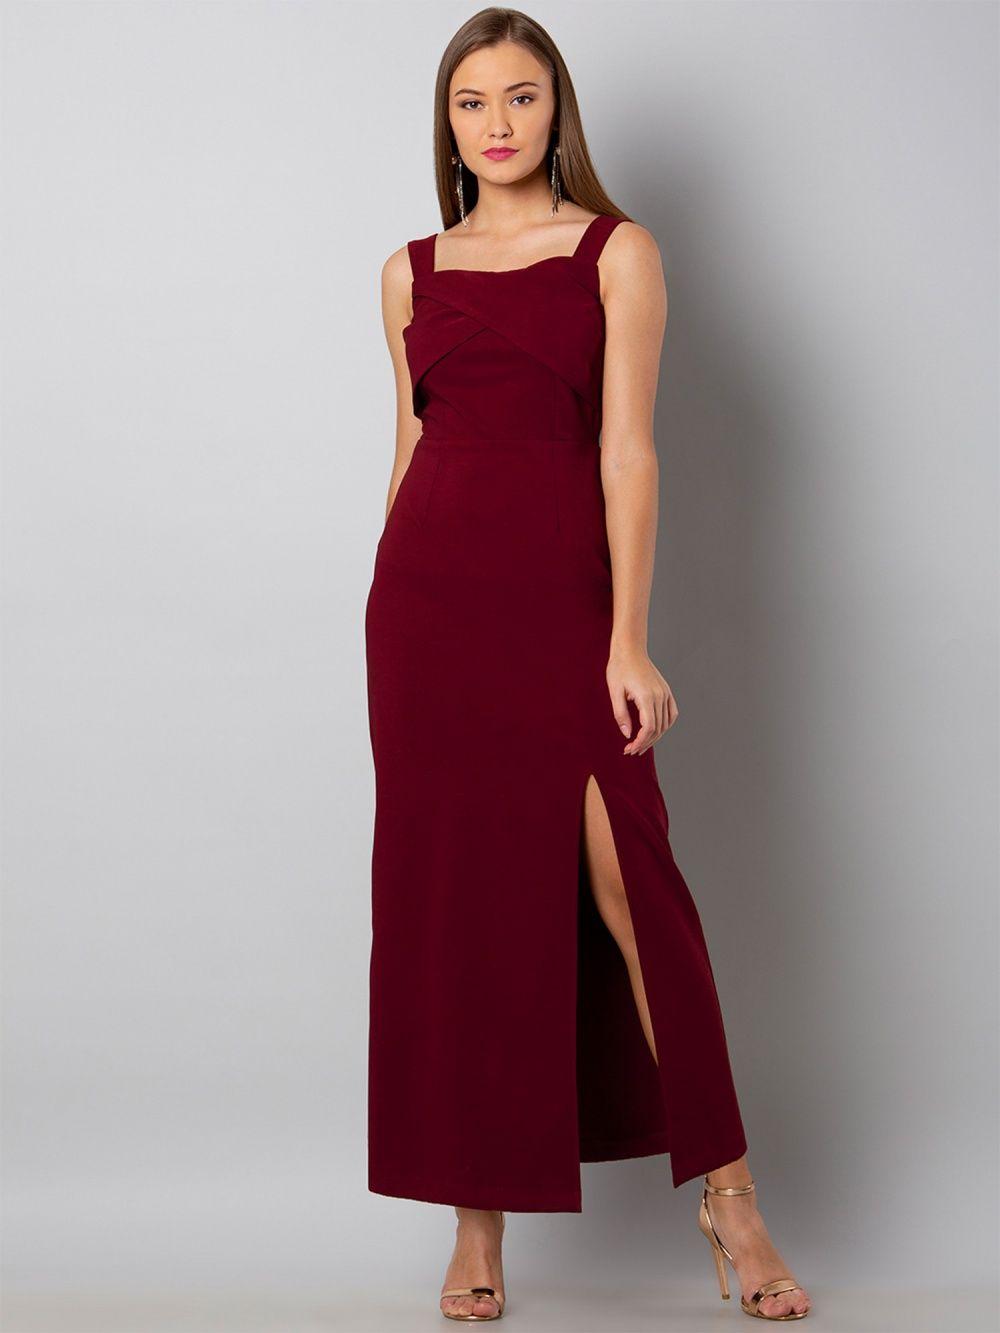 3960c830a3101b Faballey Dresses : Buy Faballey Maroon Overlap Yoke Maxi Dress ...